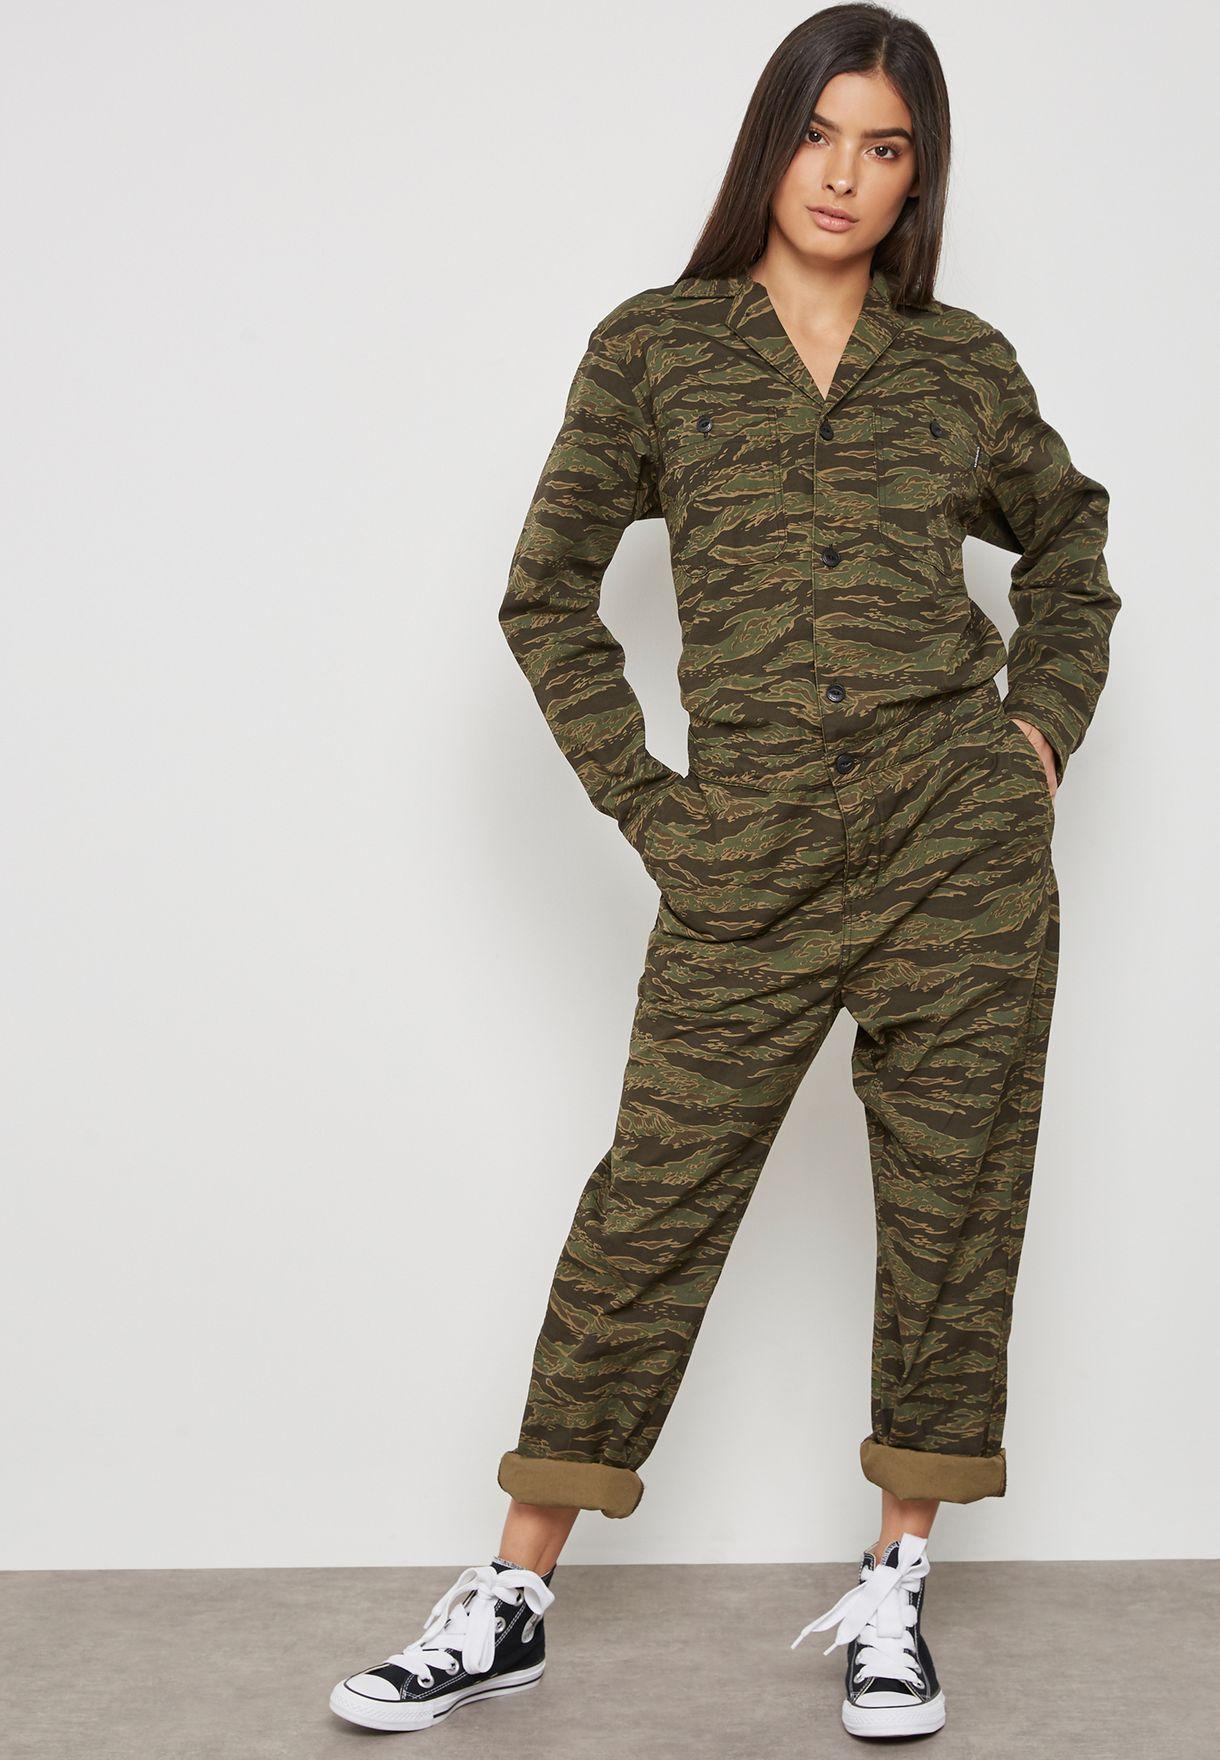 Camo Print Jumpsuit